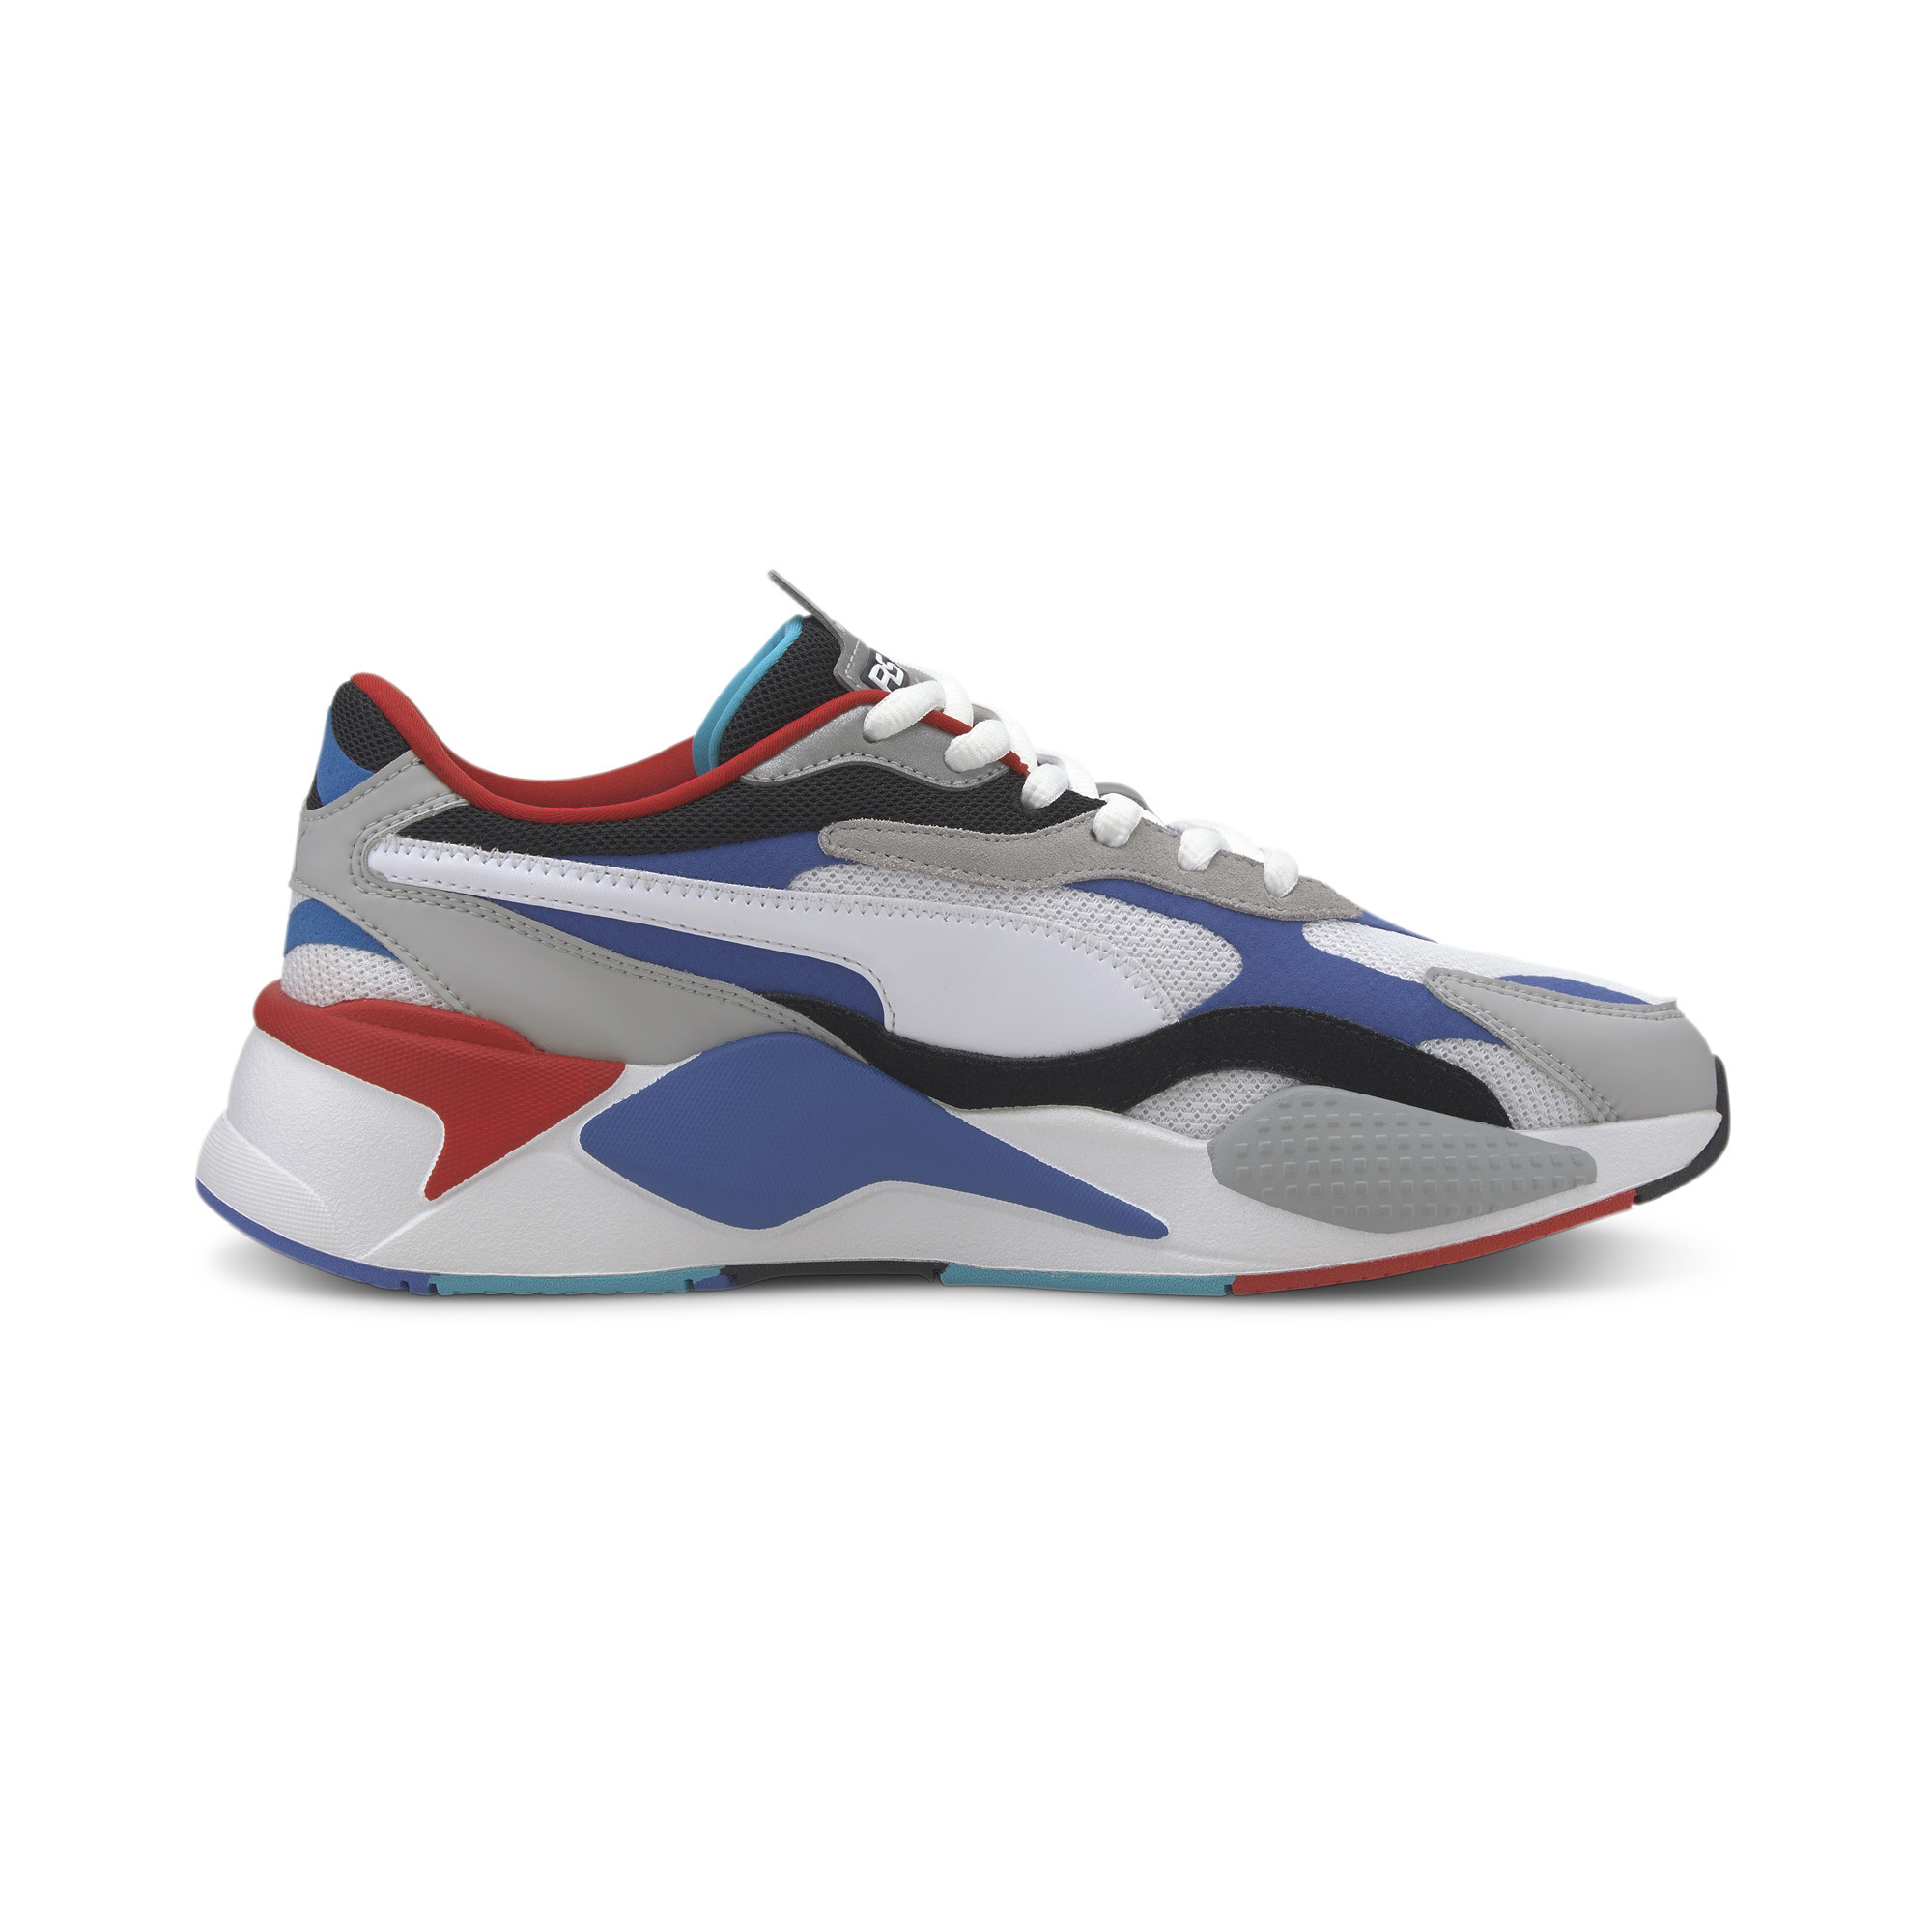 PUMA-Men-039-s-RS-X-Puzzle-Sneakers thumbnail 7